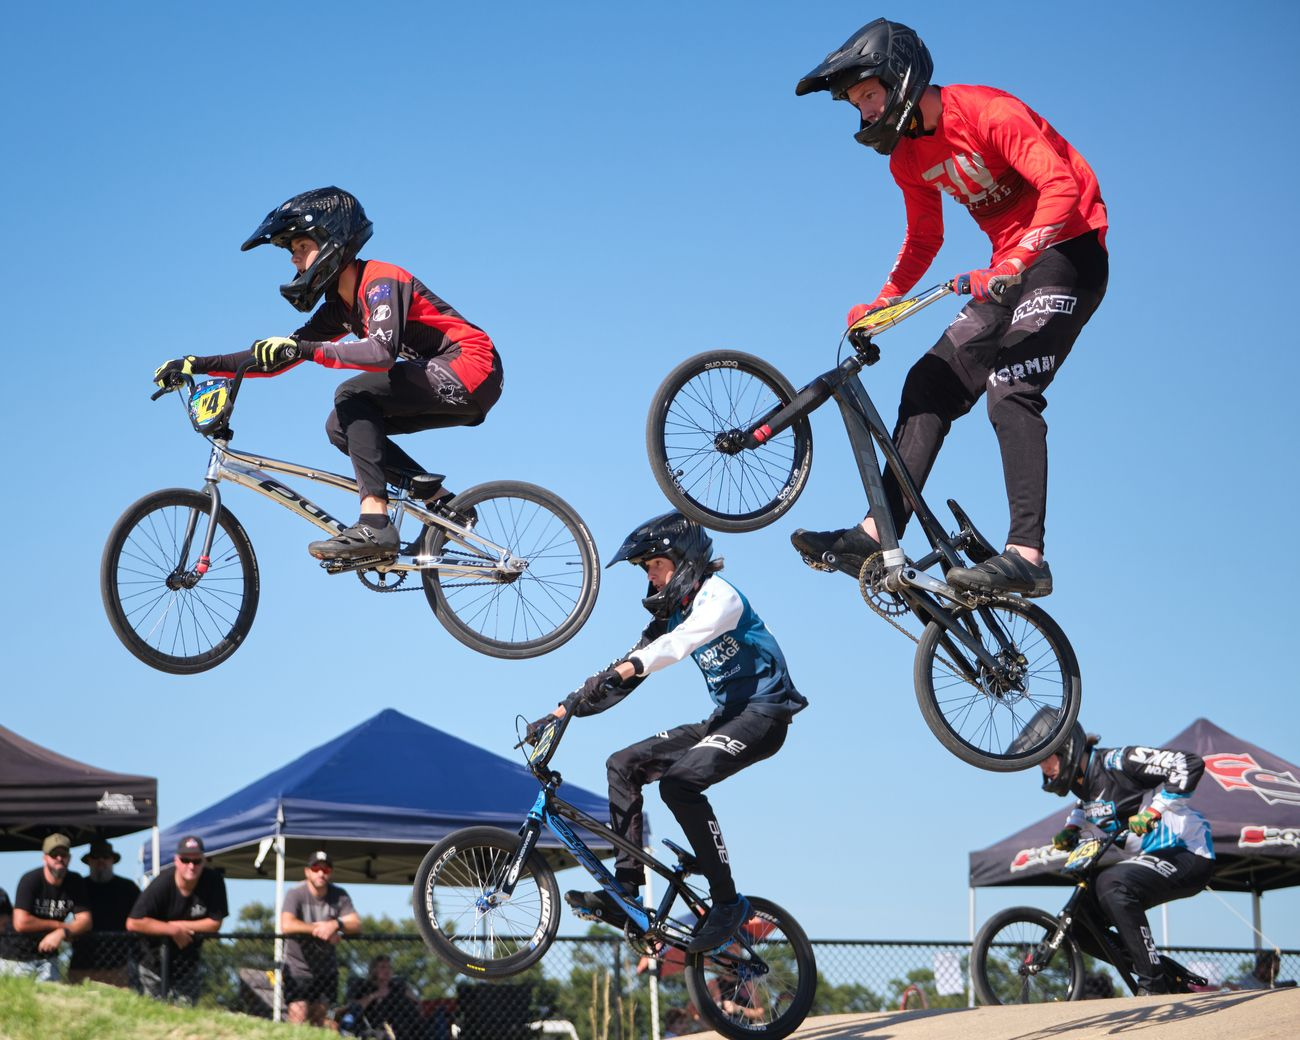 BMX Racing in Australia